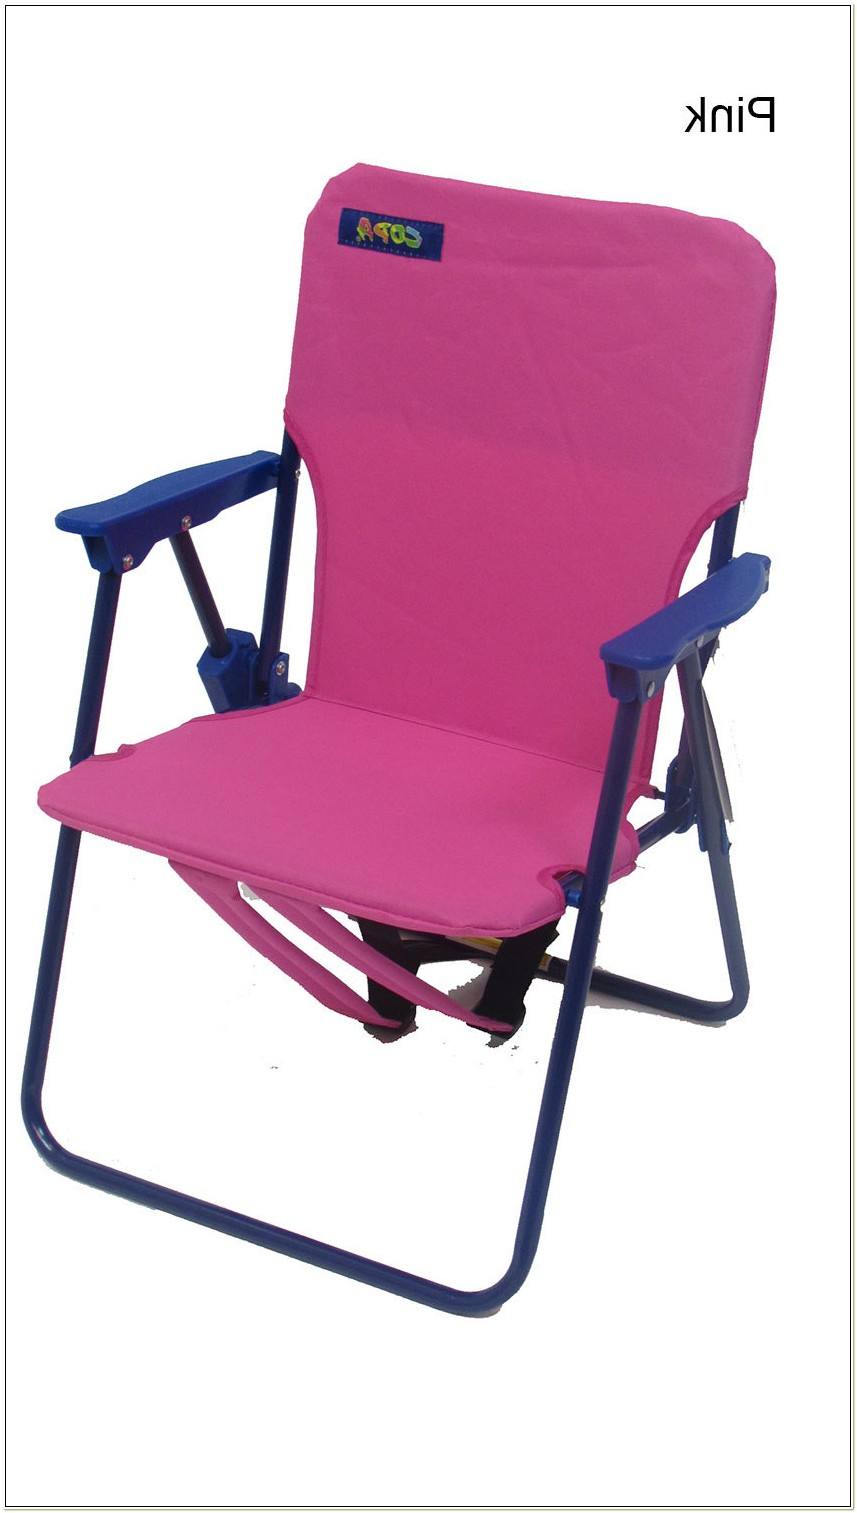 Lands End Backpack Beach Chair